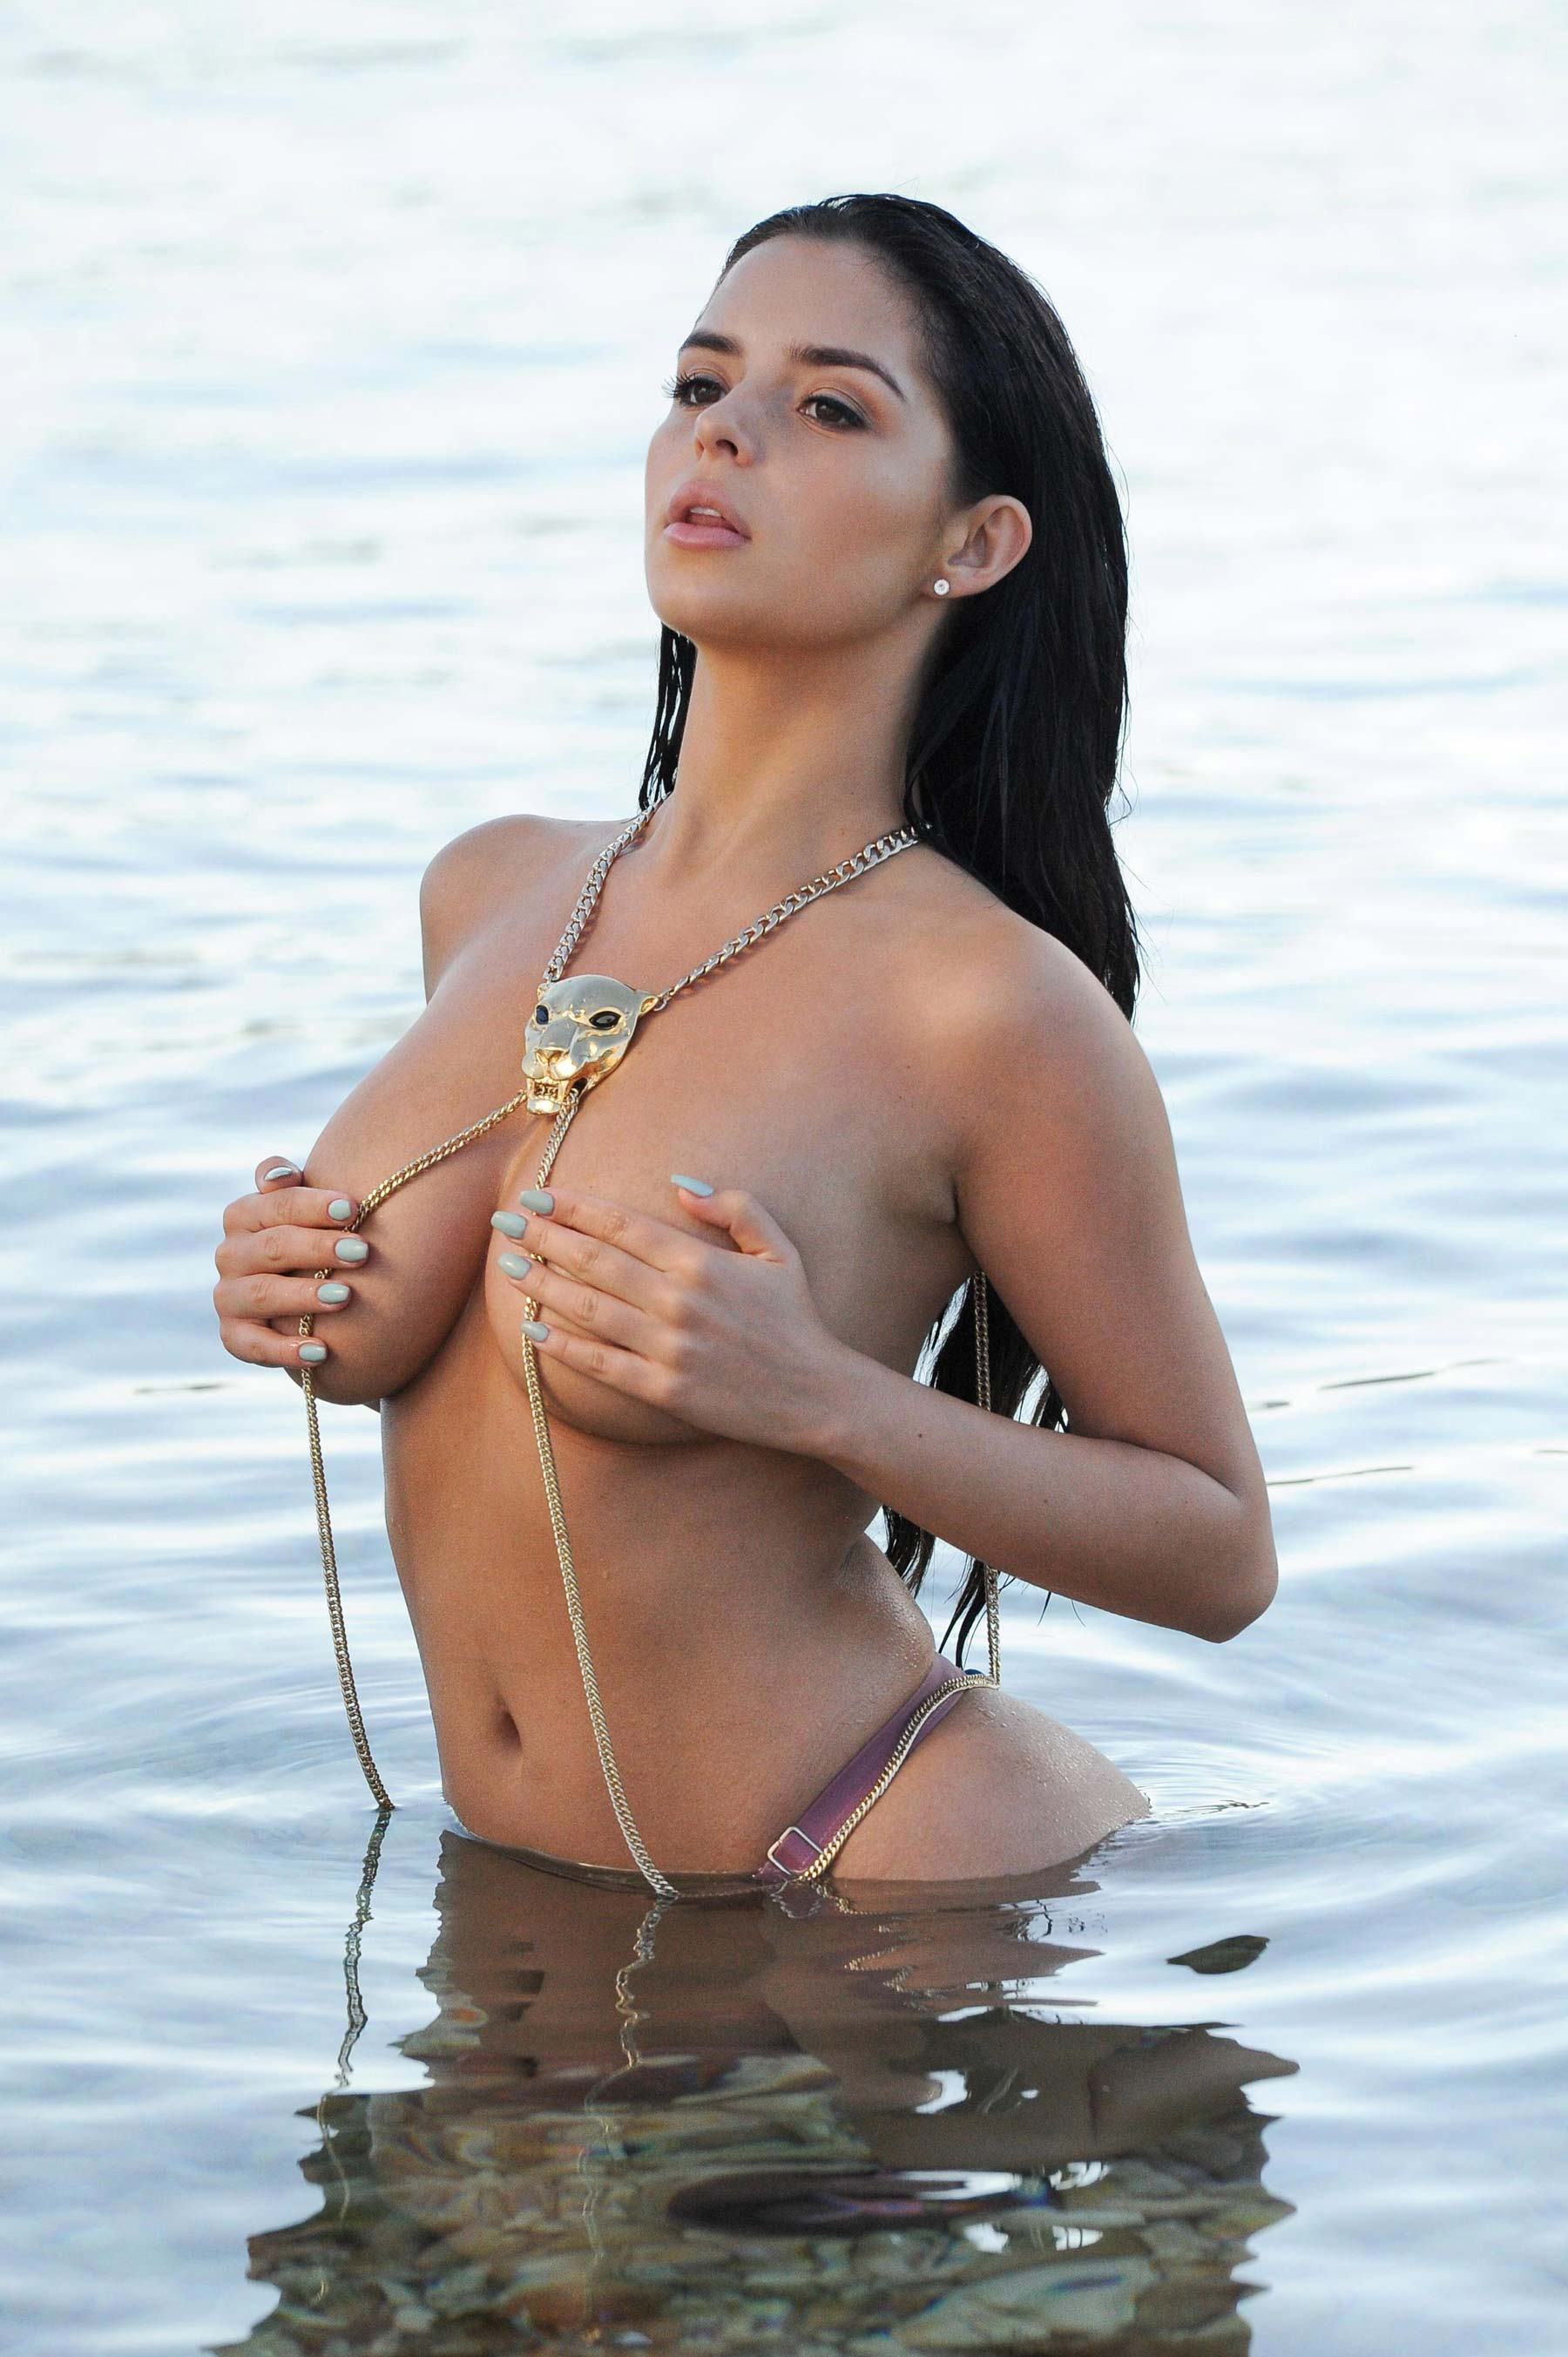 https://img5.hotnessrater.com/4510380/demi-rose-mawby-topless.jpg?w=4000&h=6000